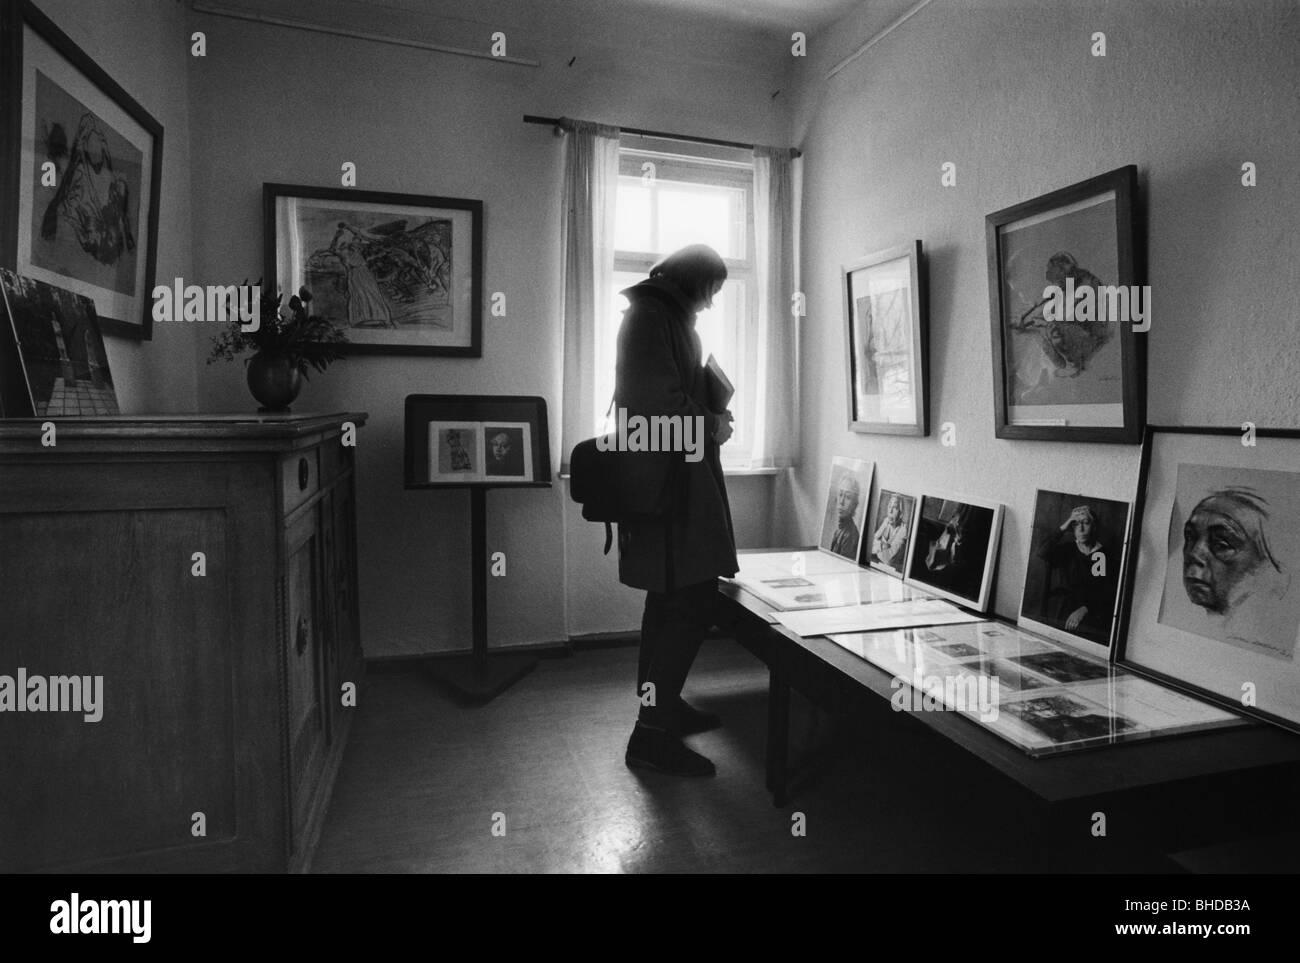 Kollwitz, Kaethe, 8.7.1867 - 22.4.1945, German painter, printmaker, the house were she died, Moritzburg, Saxony, - Stock Image